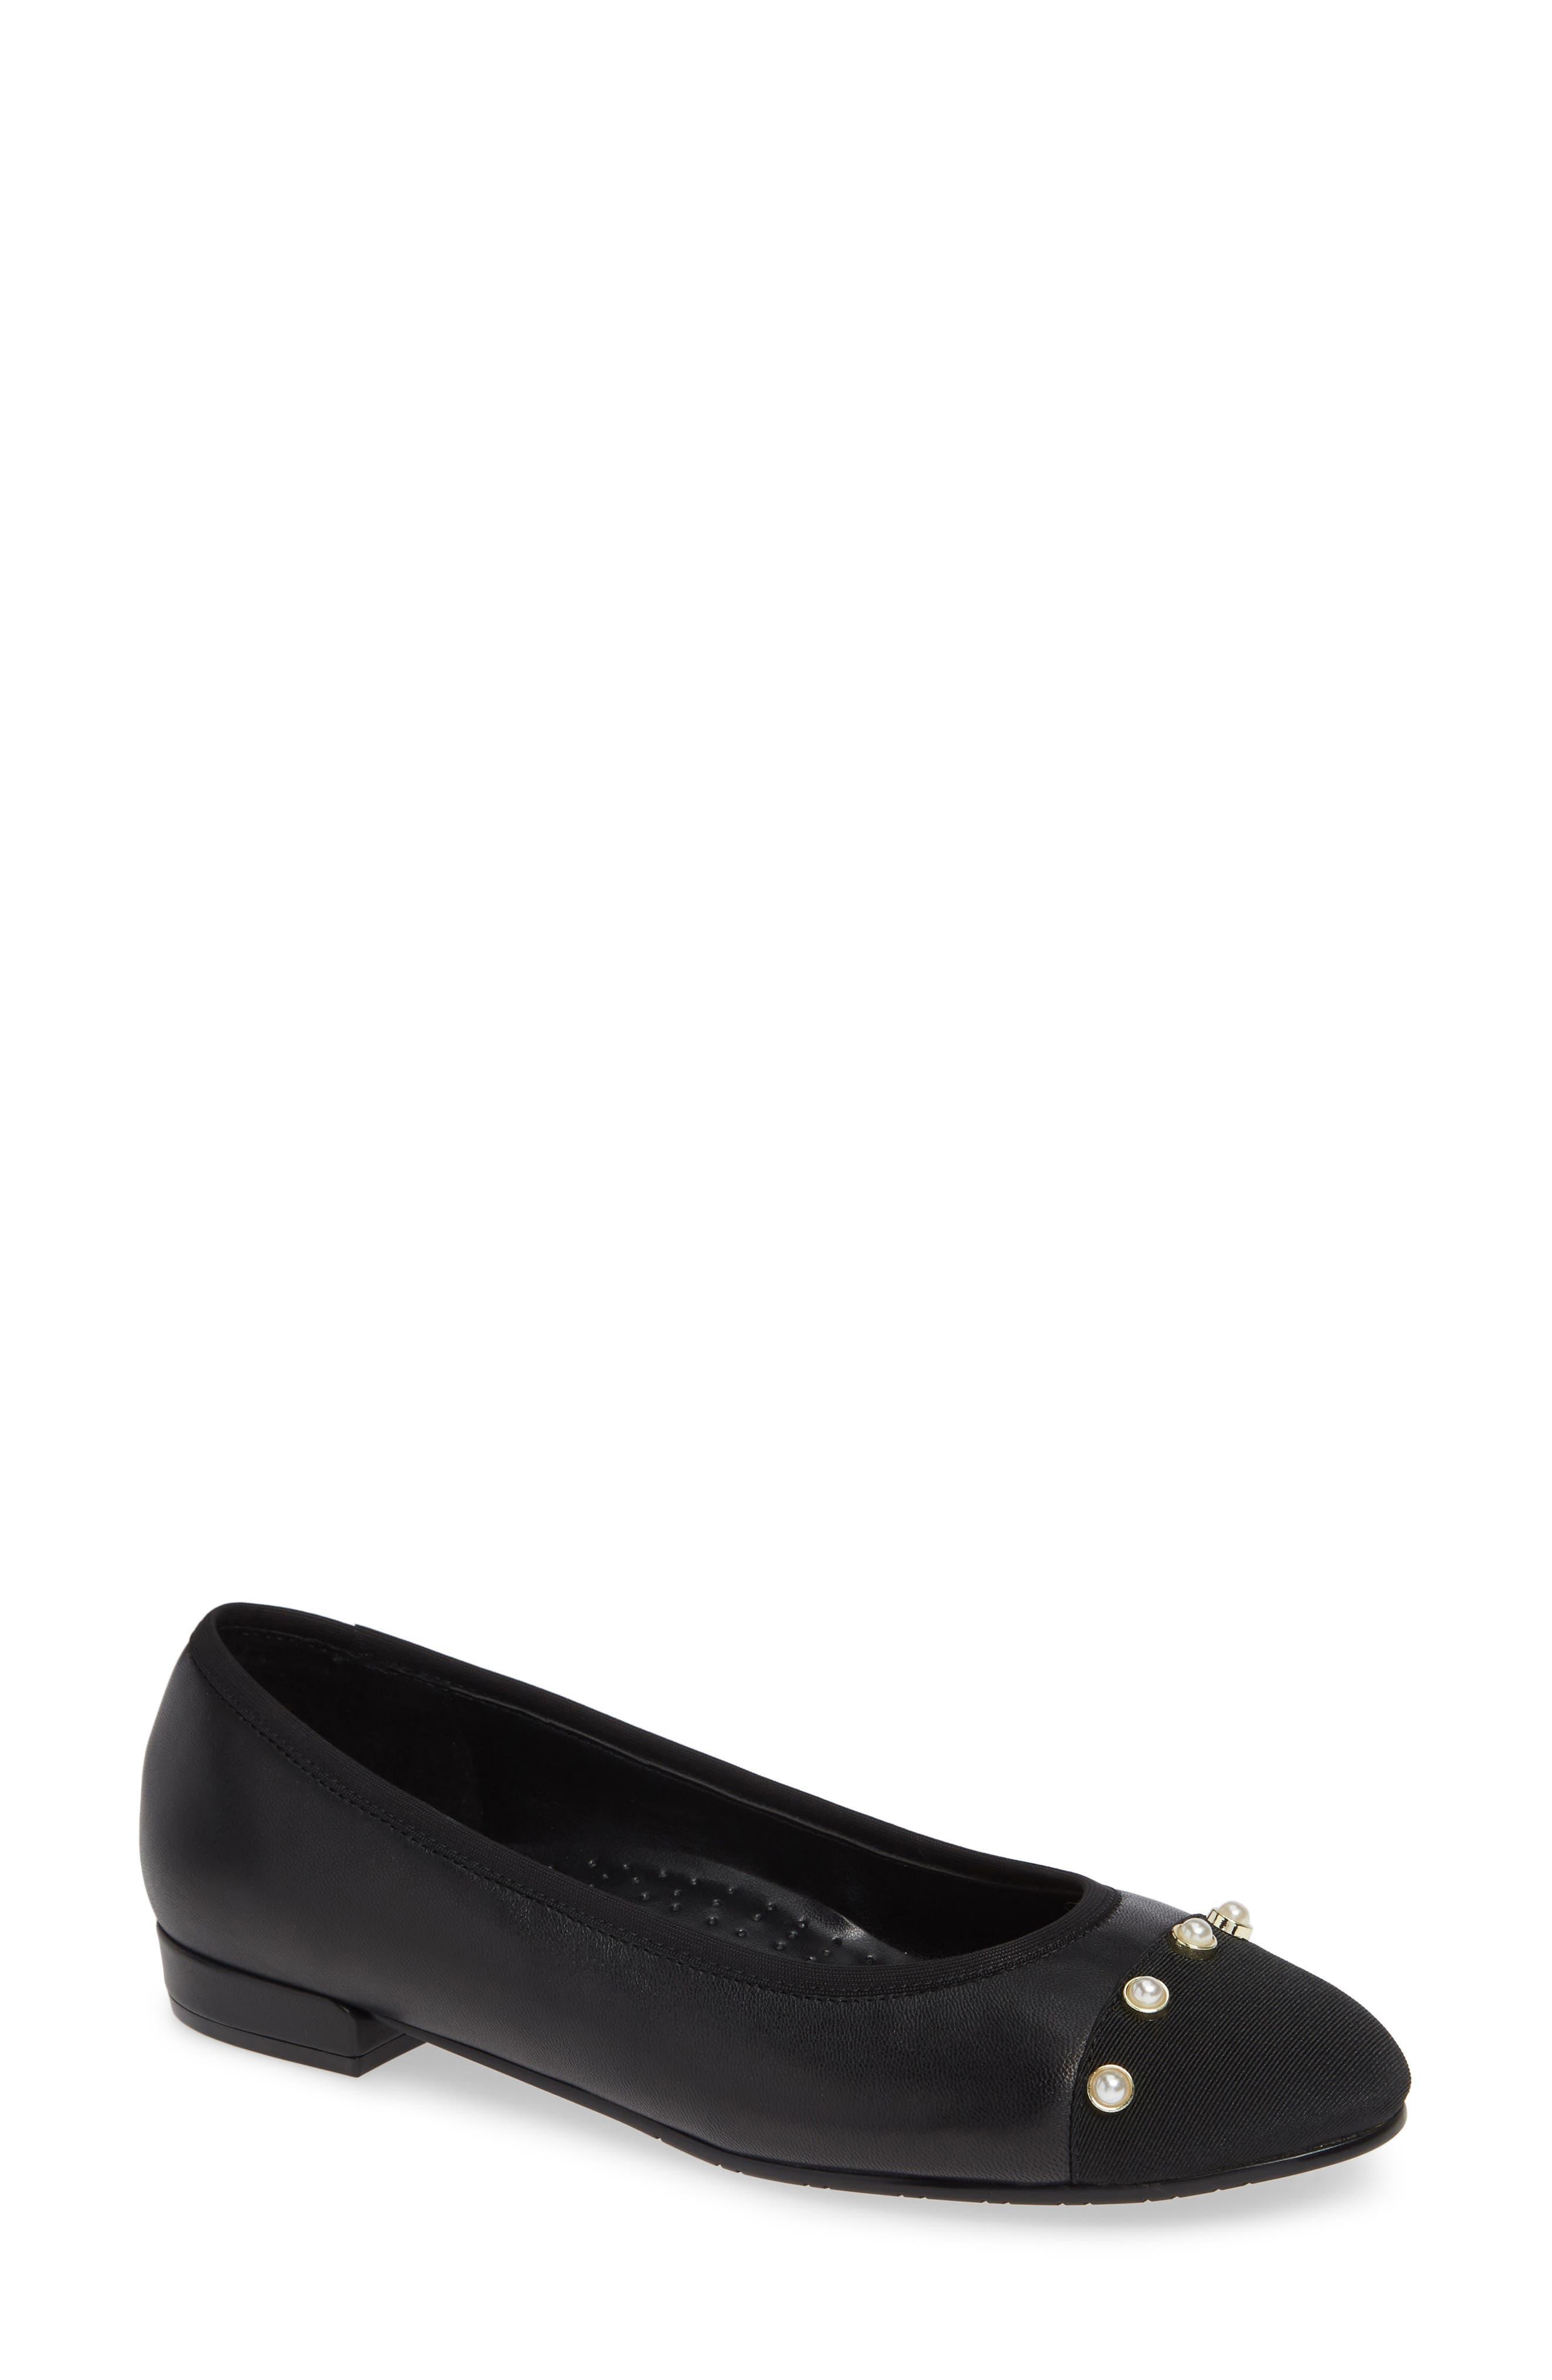 f46e8b3d498 Flats VANELi Shoes for Women